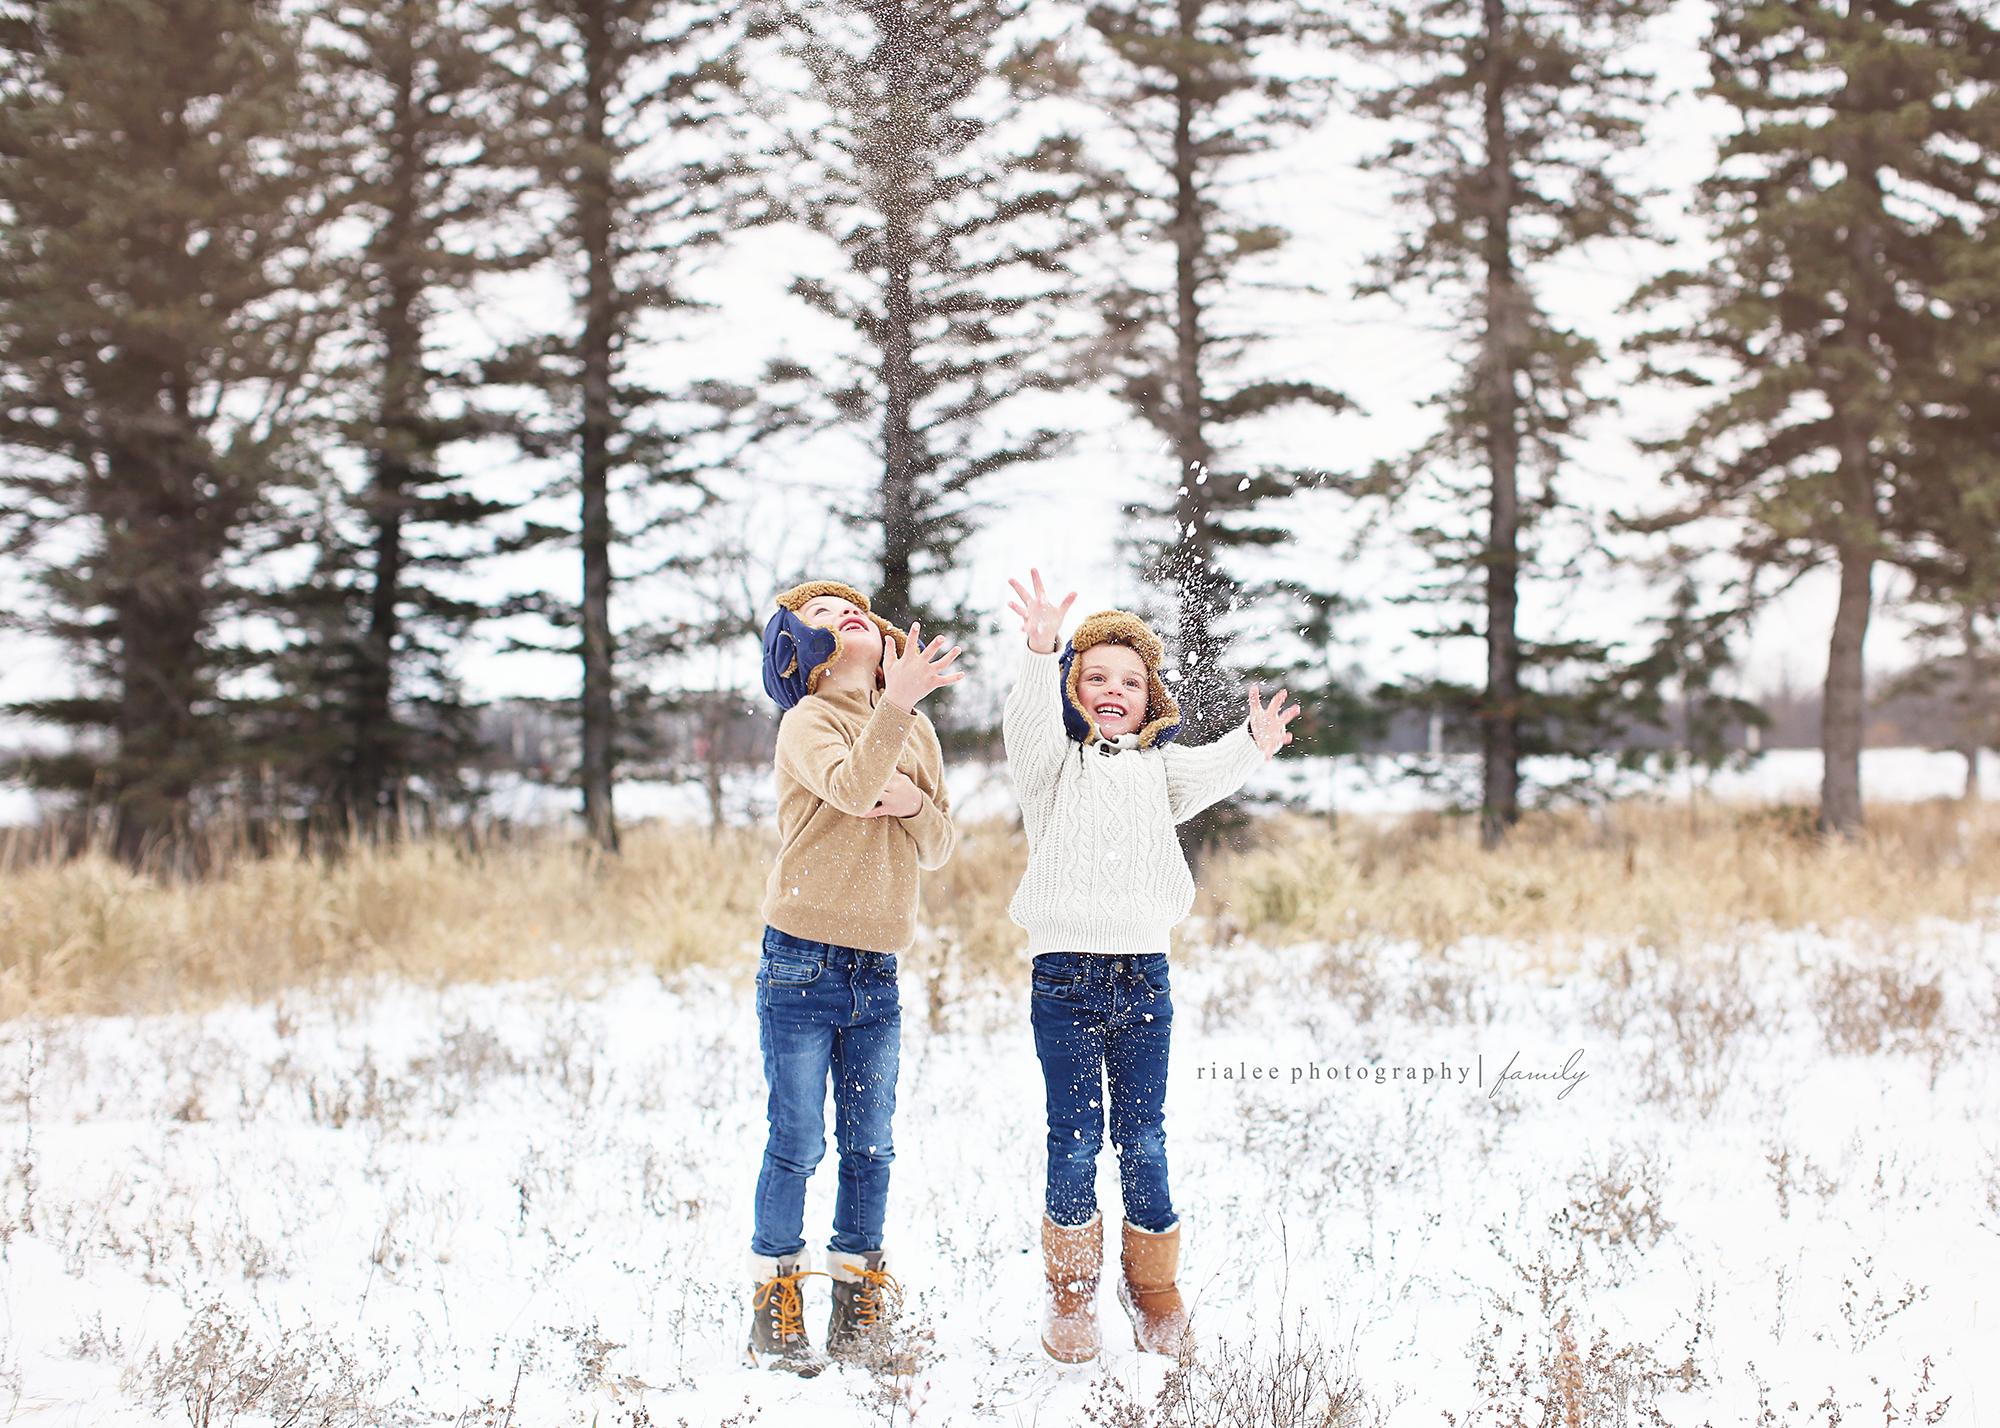 wintersnowphotoswithkids.jpg